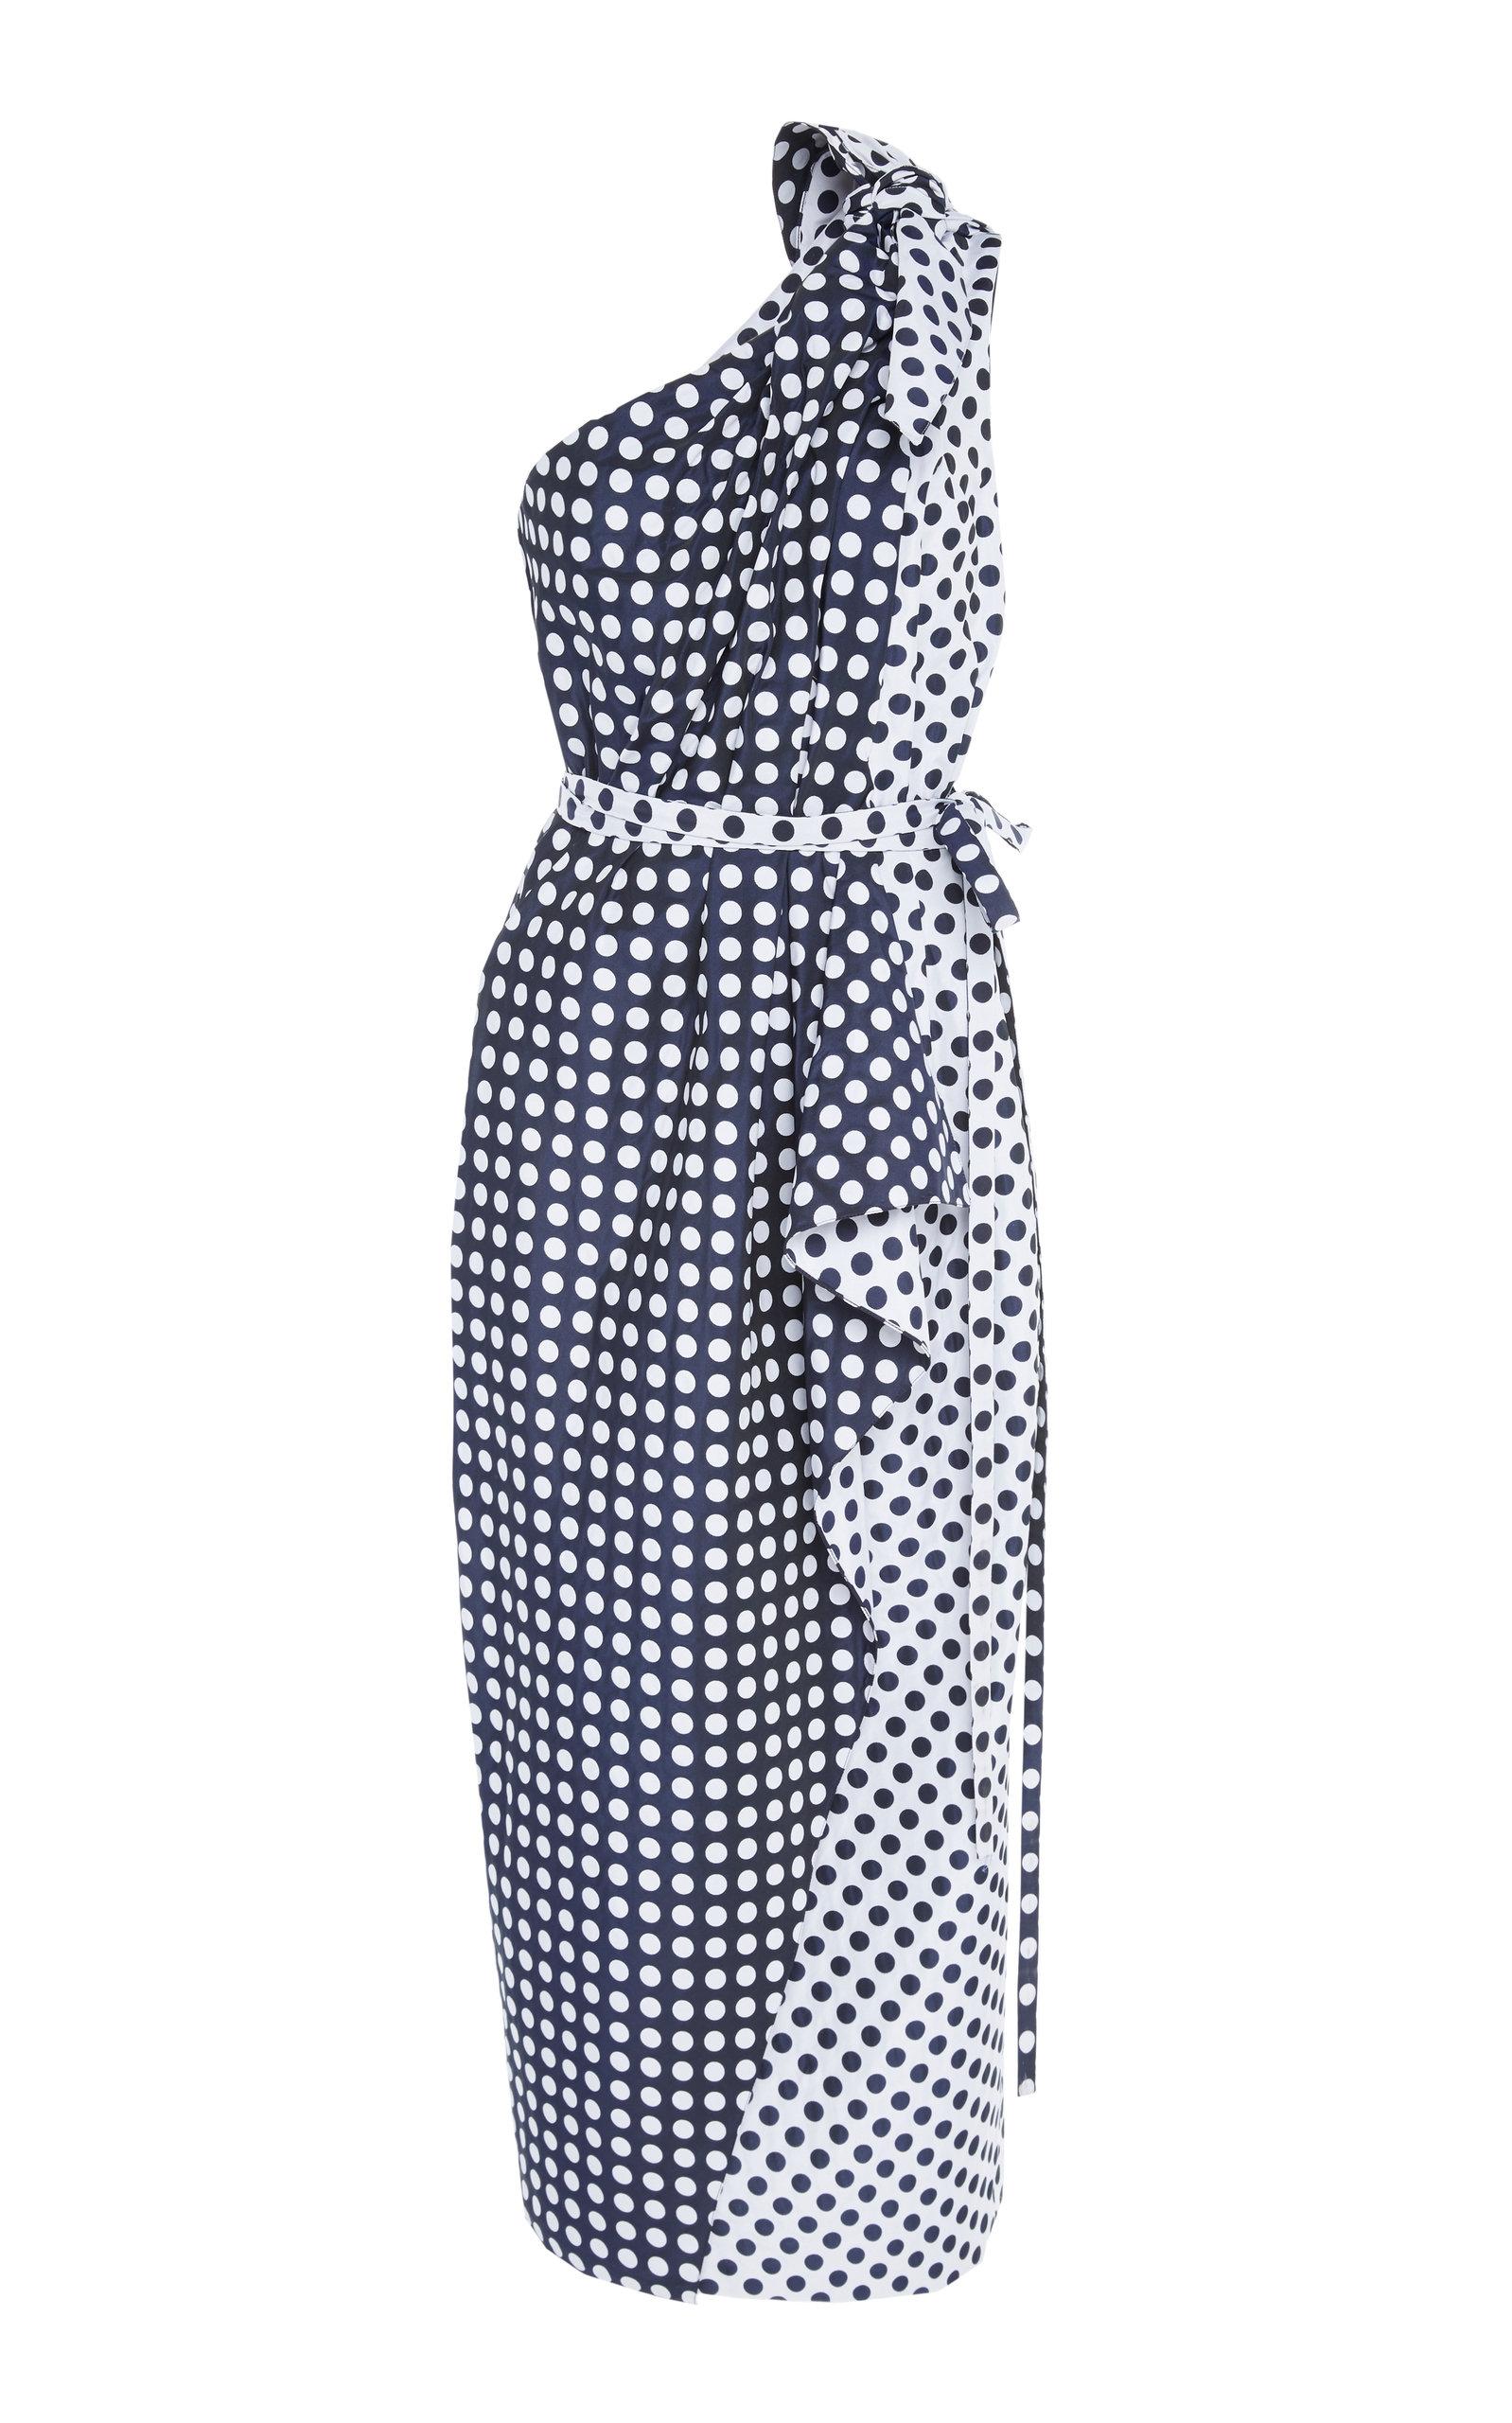 bdb509b6519f7 Carolina HerreraOne-Shoulder Polka-Dot Crepe De Chine Midi Dress. CLOSE.  Loading